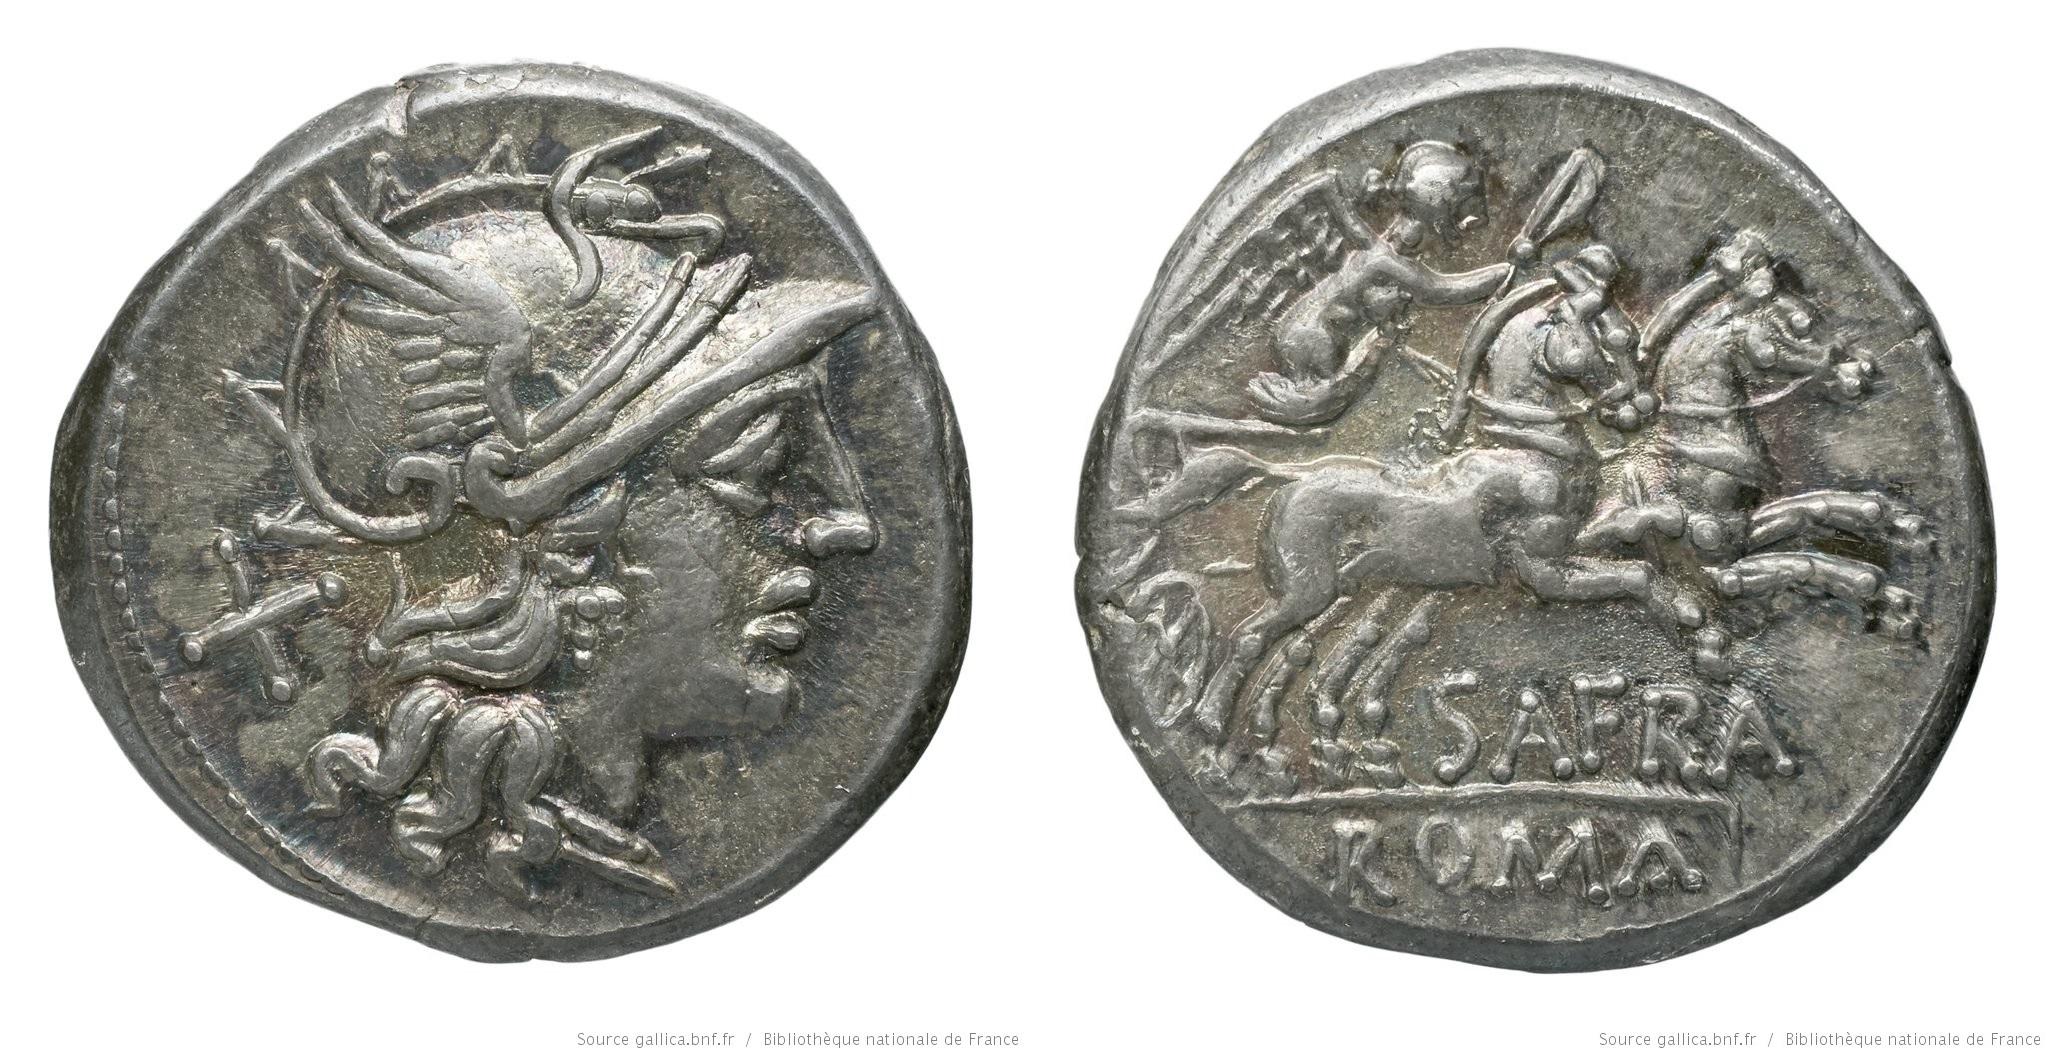 840AF – Denier Afrania – Spurius Afranius